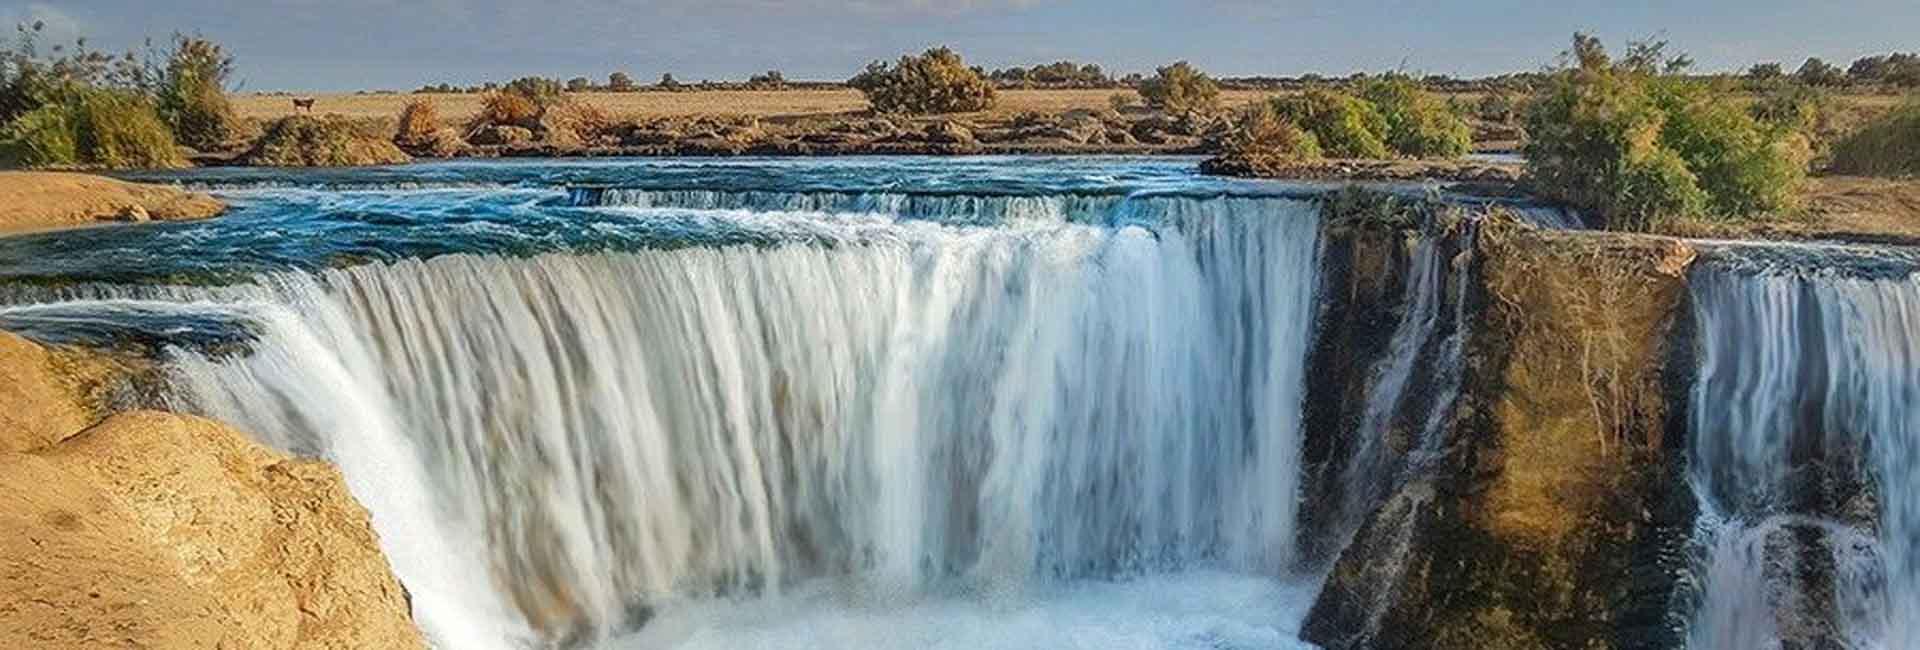 Wadi al Rayan